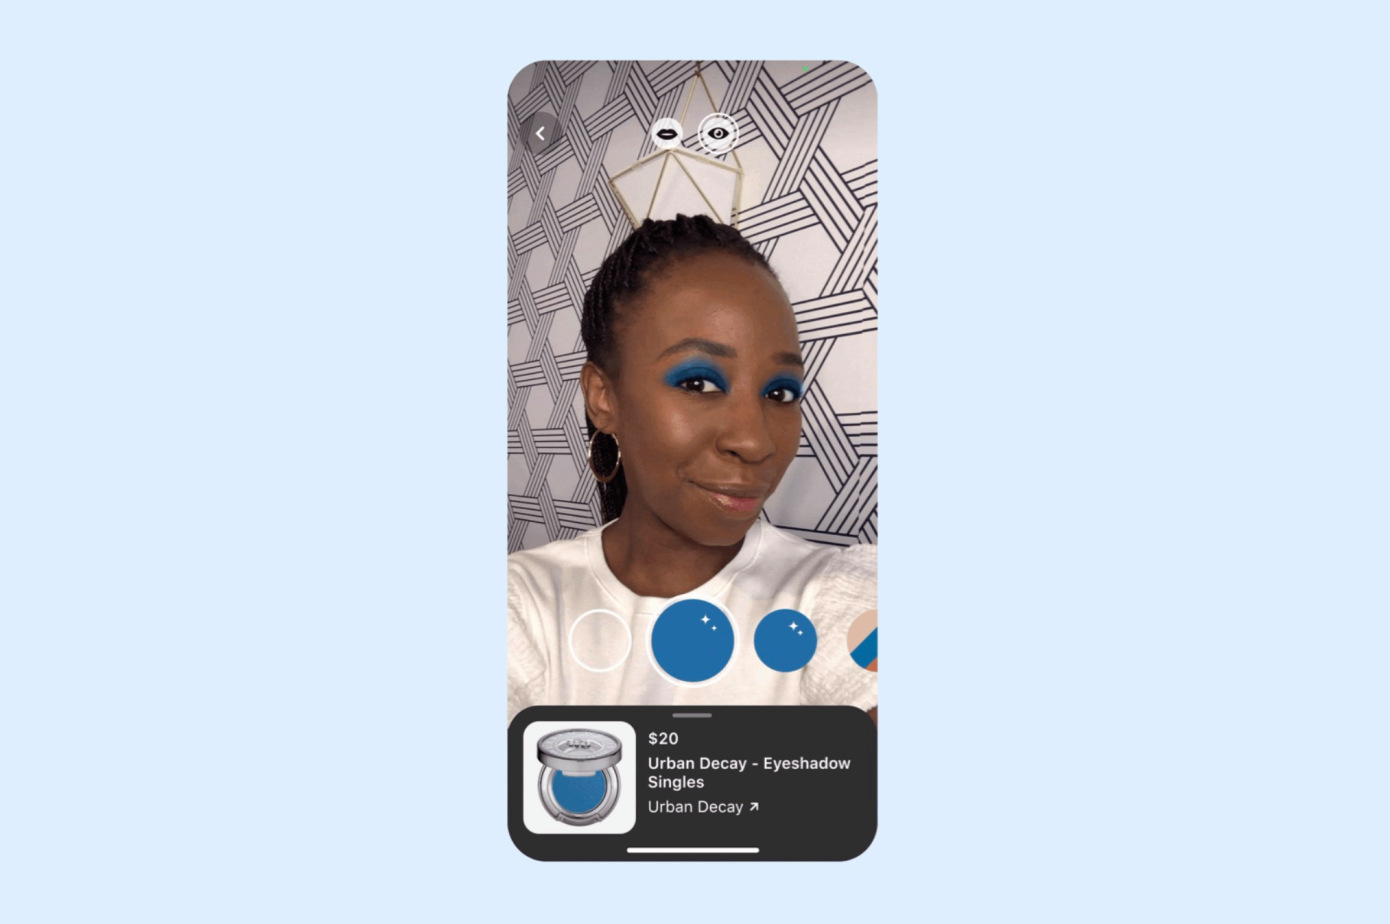 Pinterest新增AR眼影试妆功能,可支持4000种眼影试色